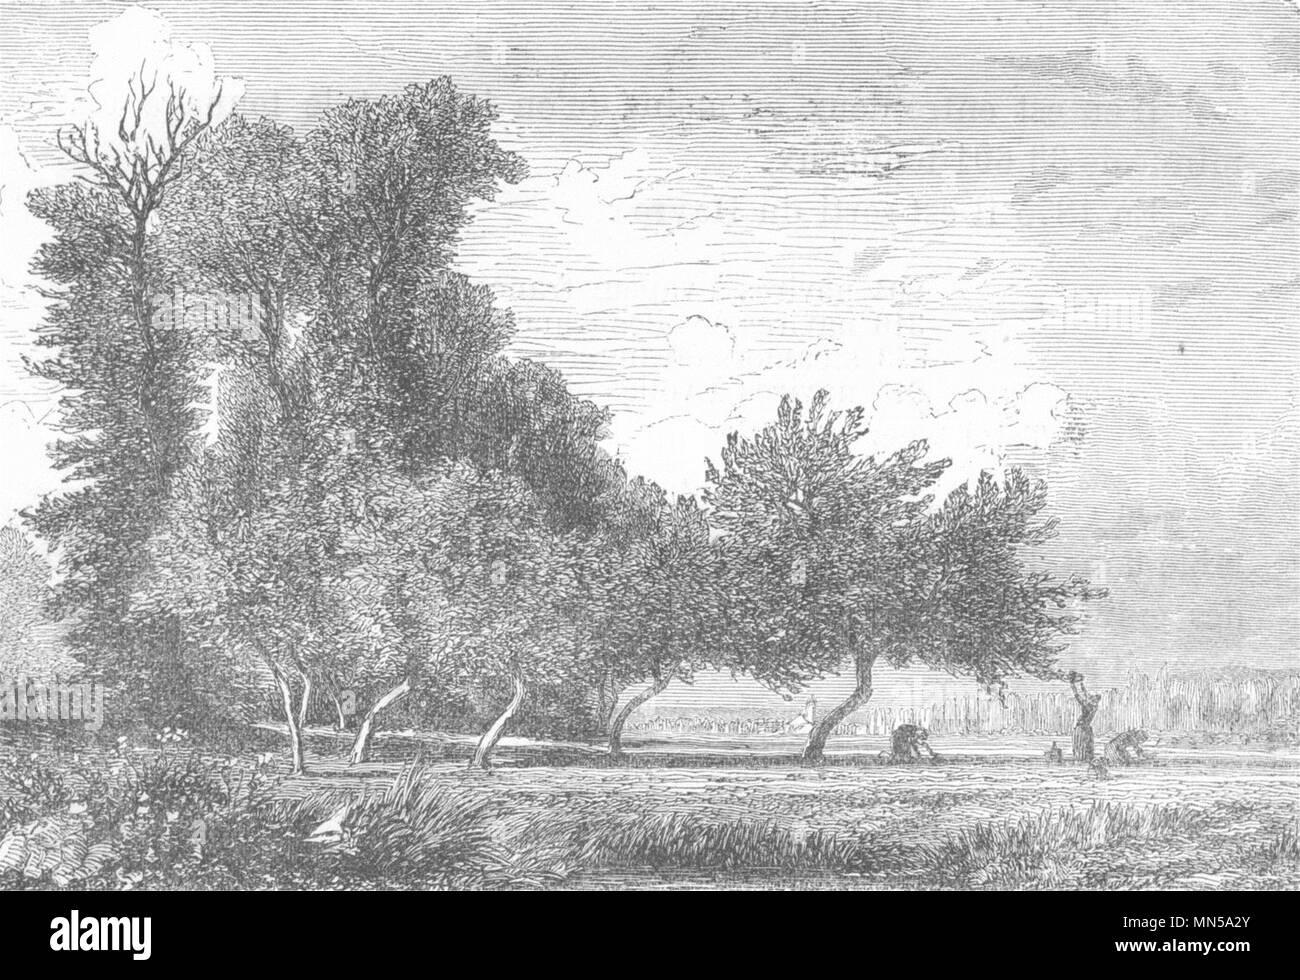 SEINE-MARITIME. Le Havre. Paysage aux environs de Gournay 1880 old print - Stock Image